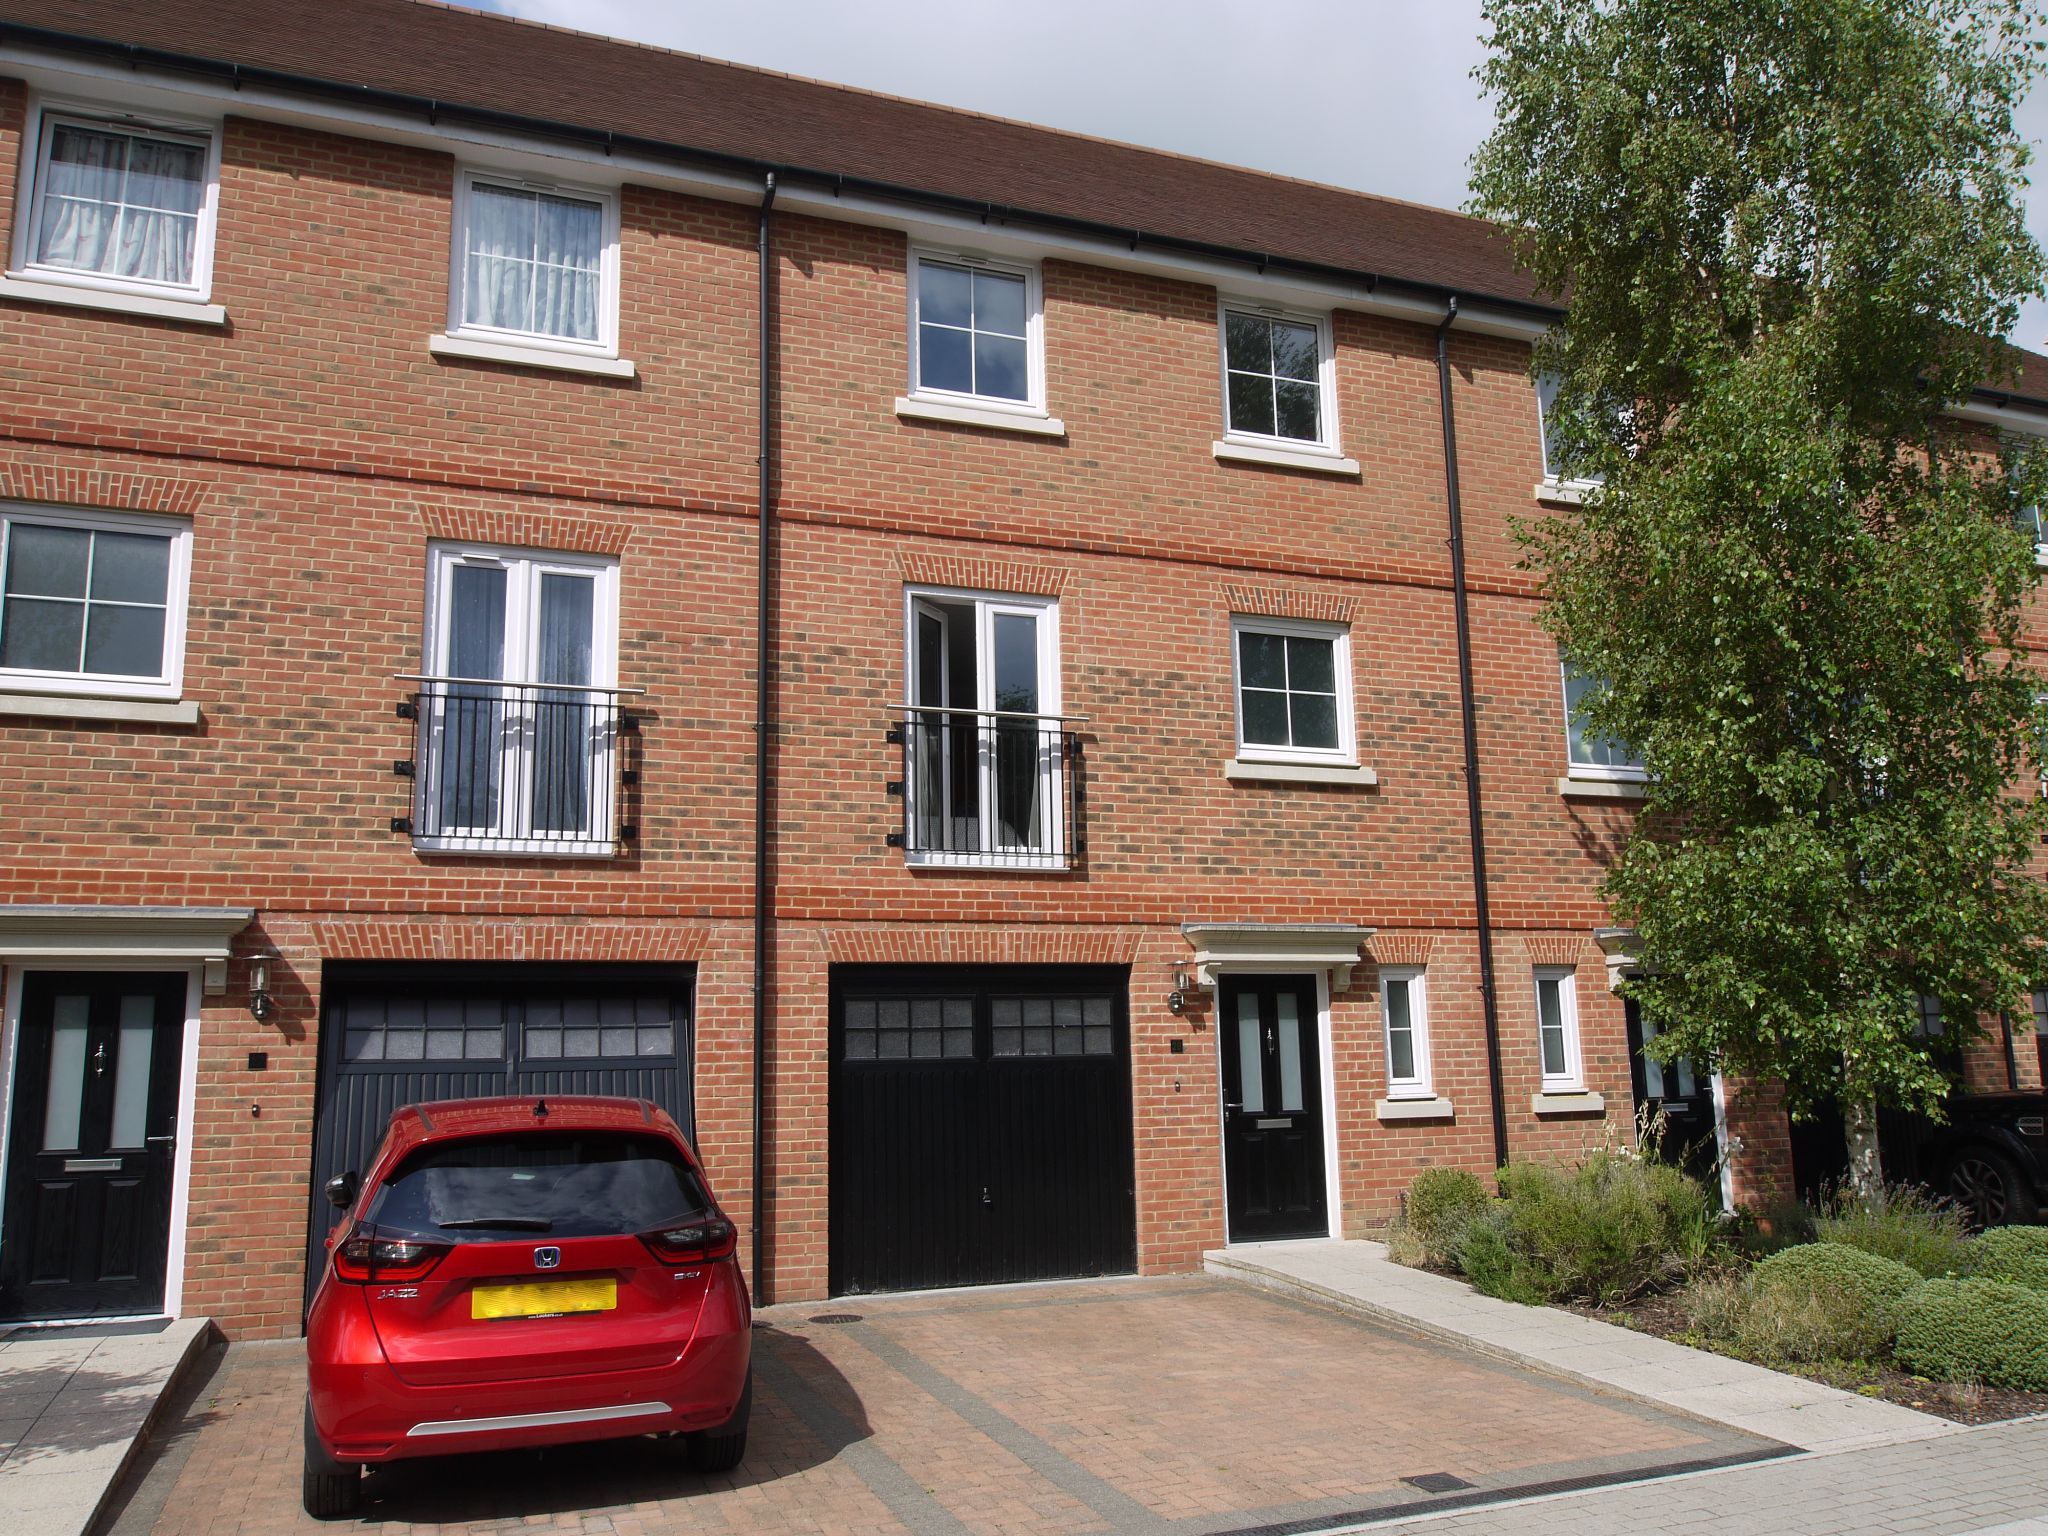 4 bedroom mid terraced house For Sale in Sevenoaks - Photograph 1